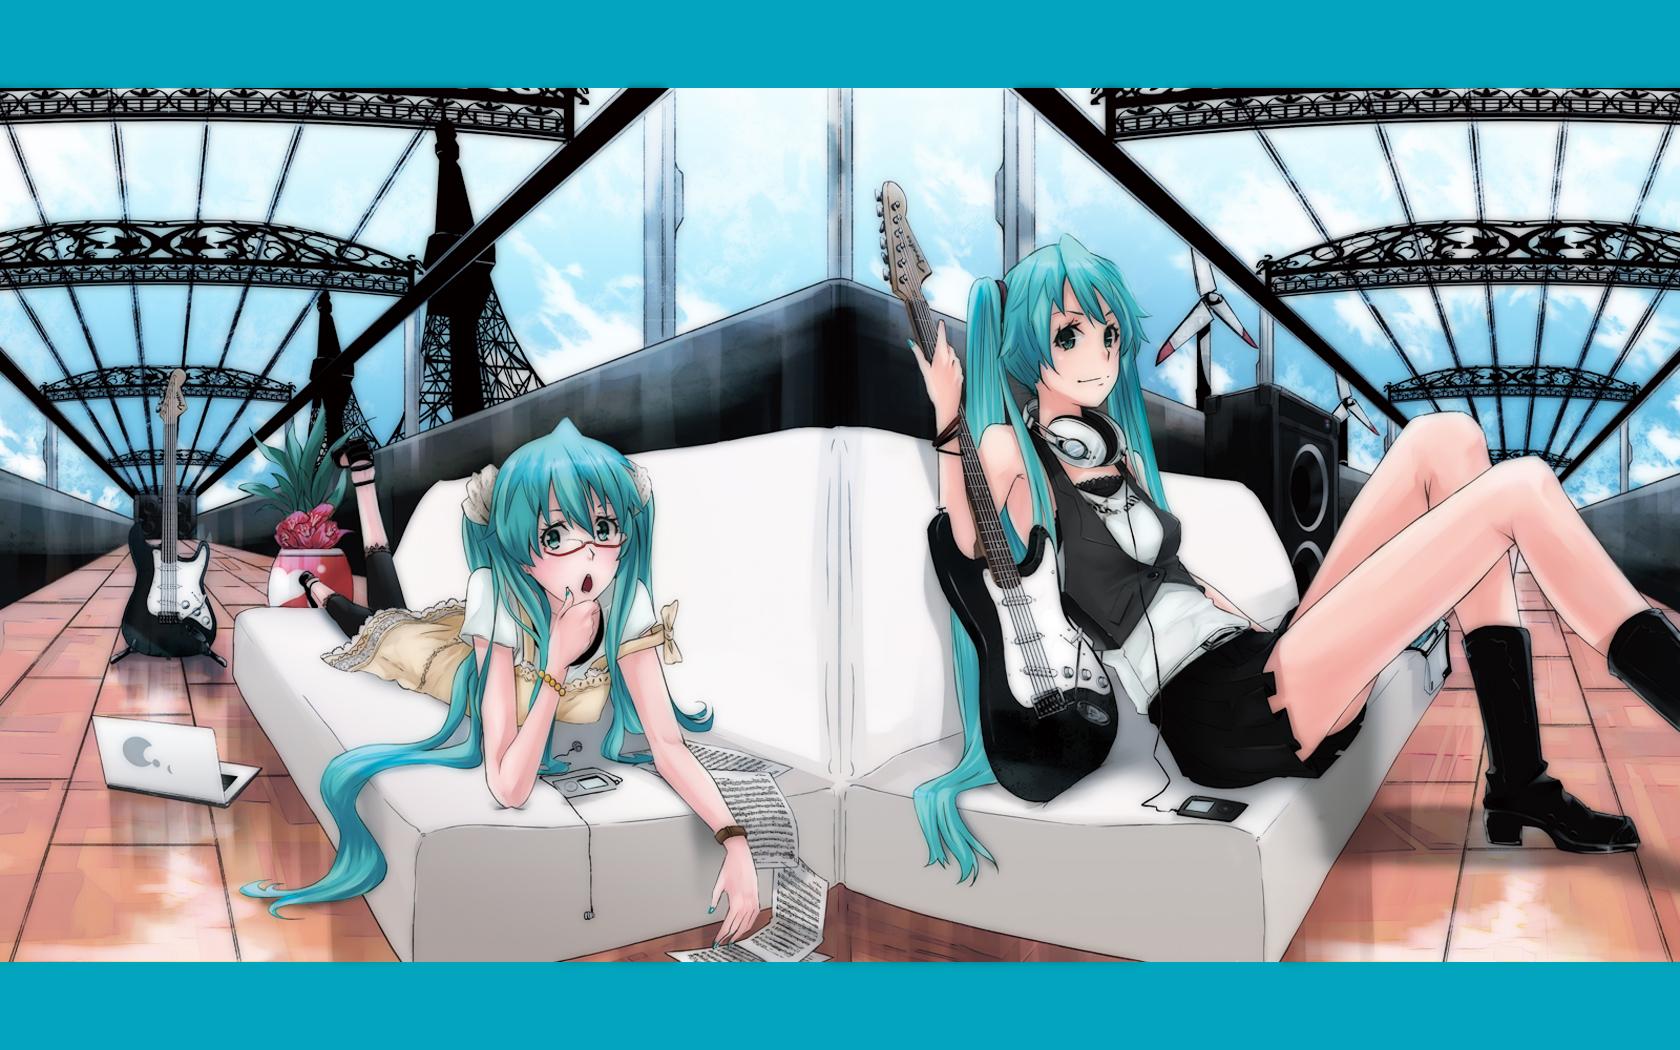 Anime - Vocaloid  Hatsune Miku Wallpaper